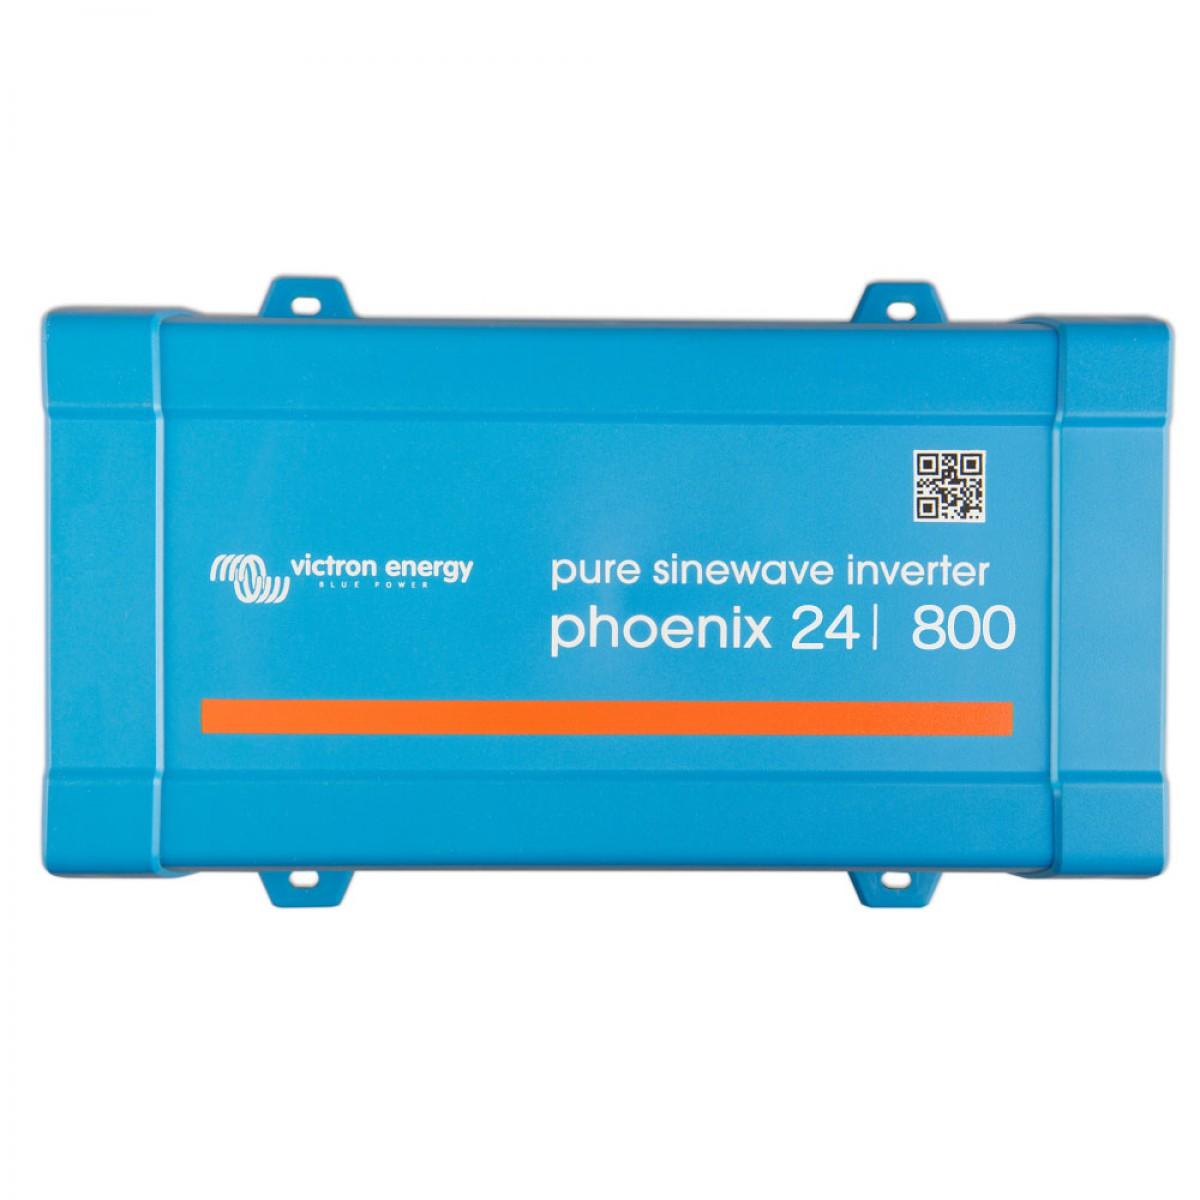 1 Stk Inselwechselrichter 12V 800W PVBI80012-